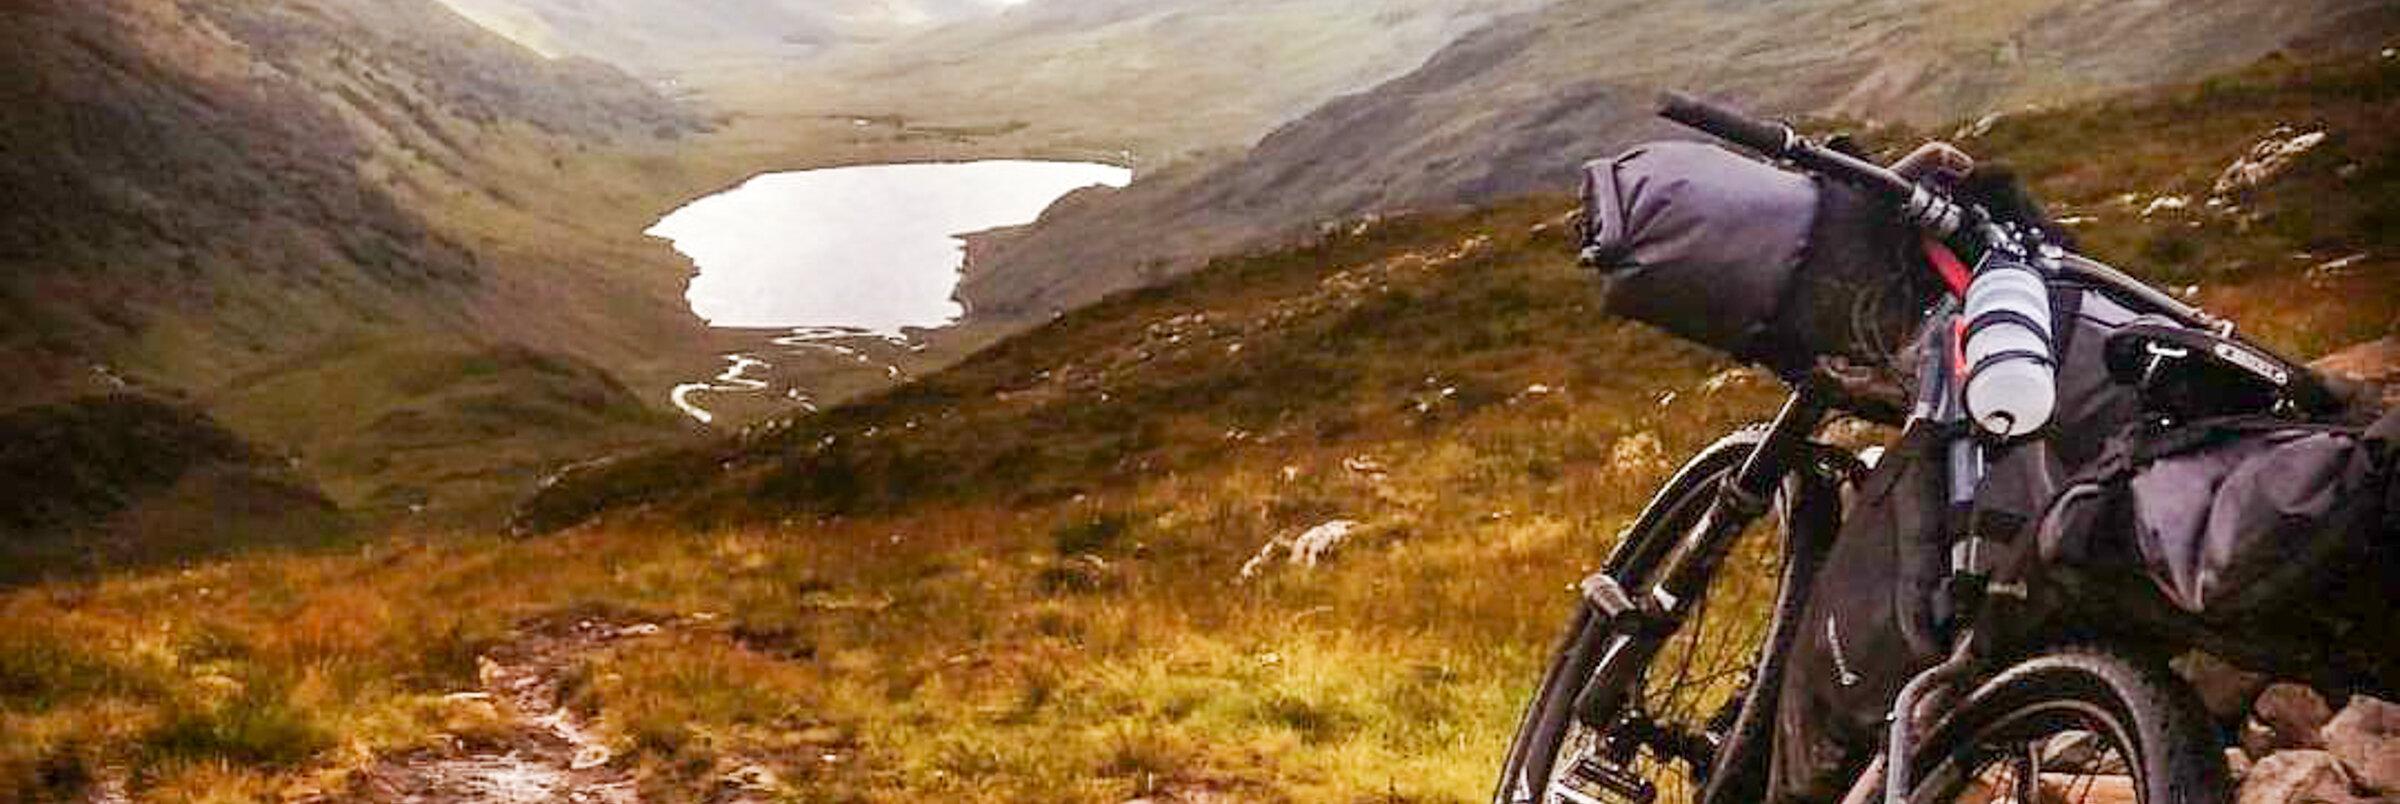 Jennys backpacking setup in Scotland - photo by Jenny Graham